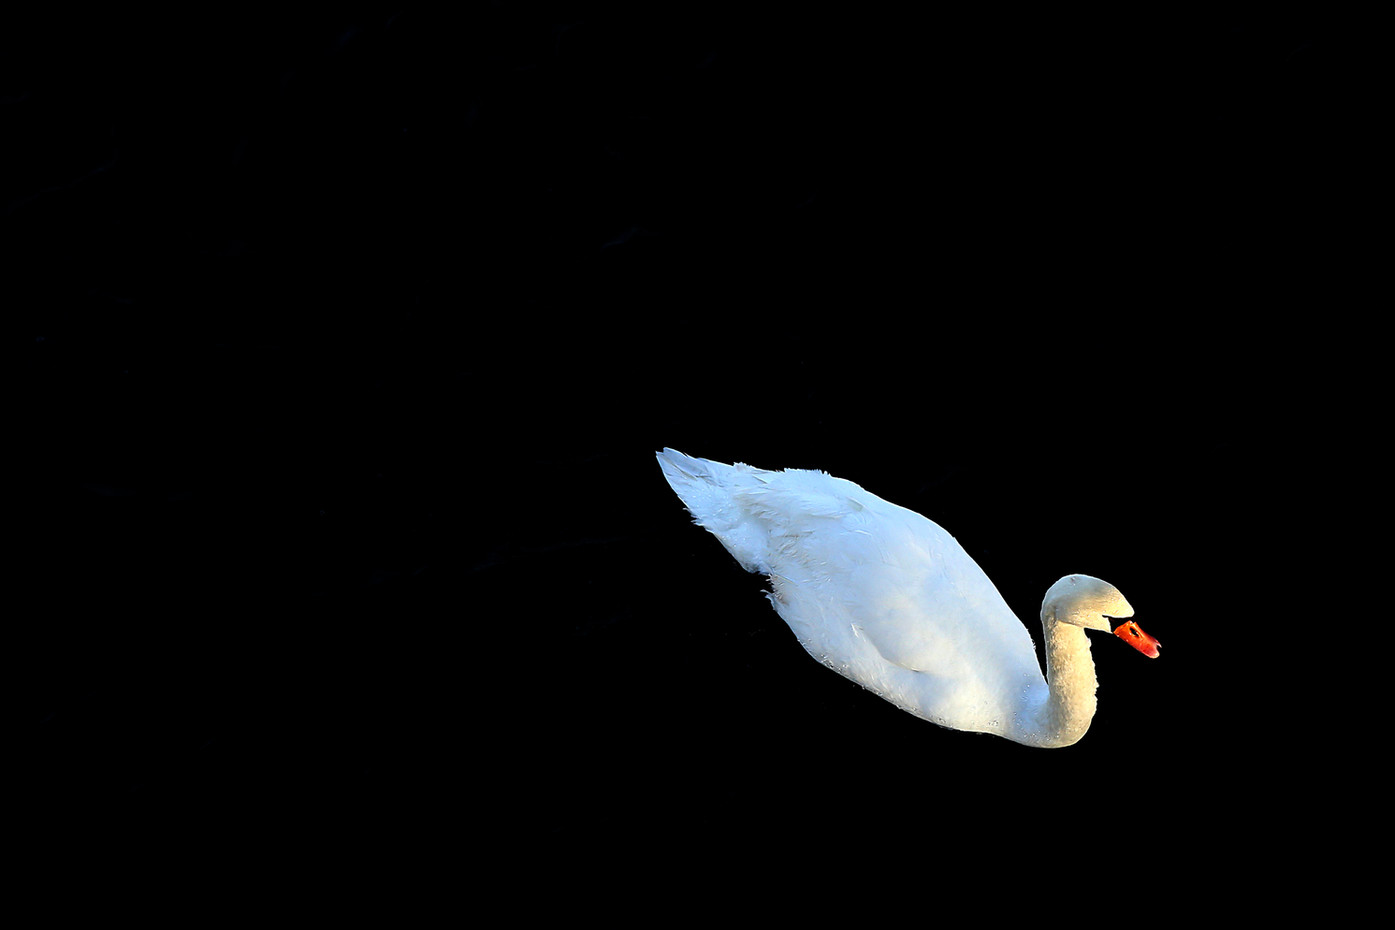 White Swan in Potsdam, Germany